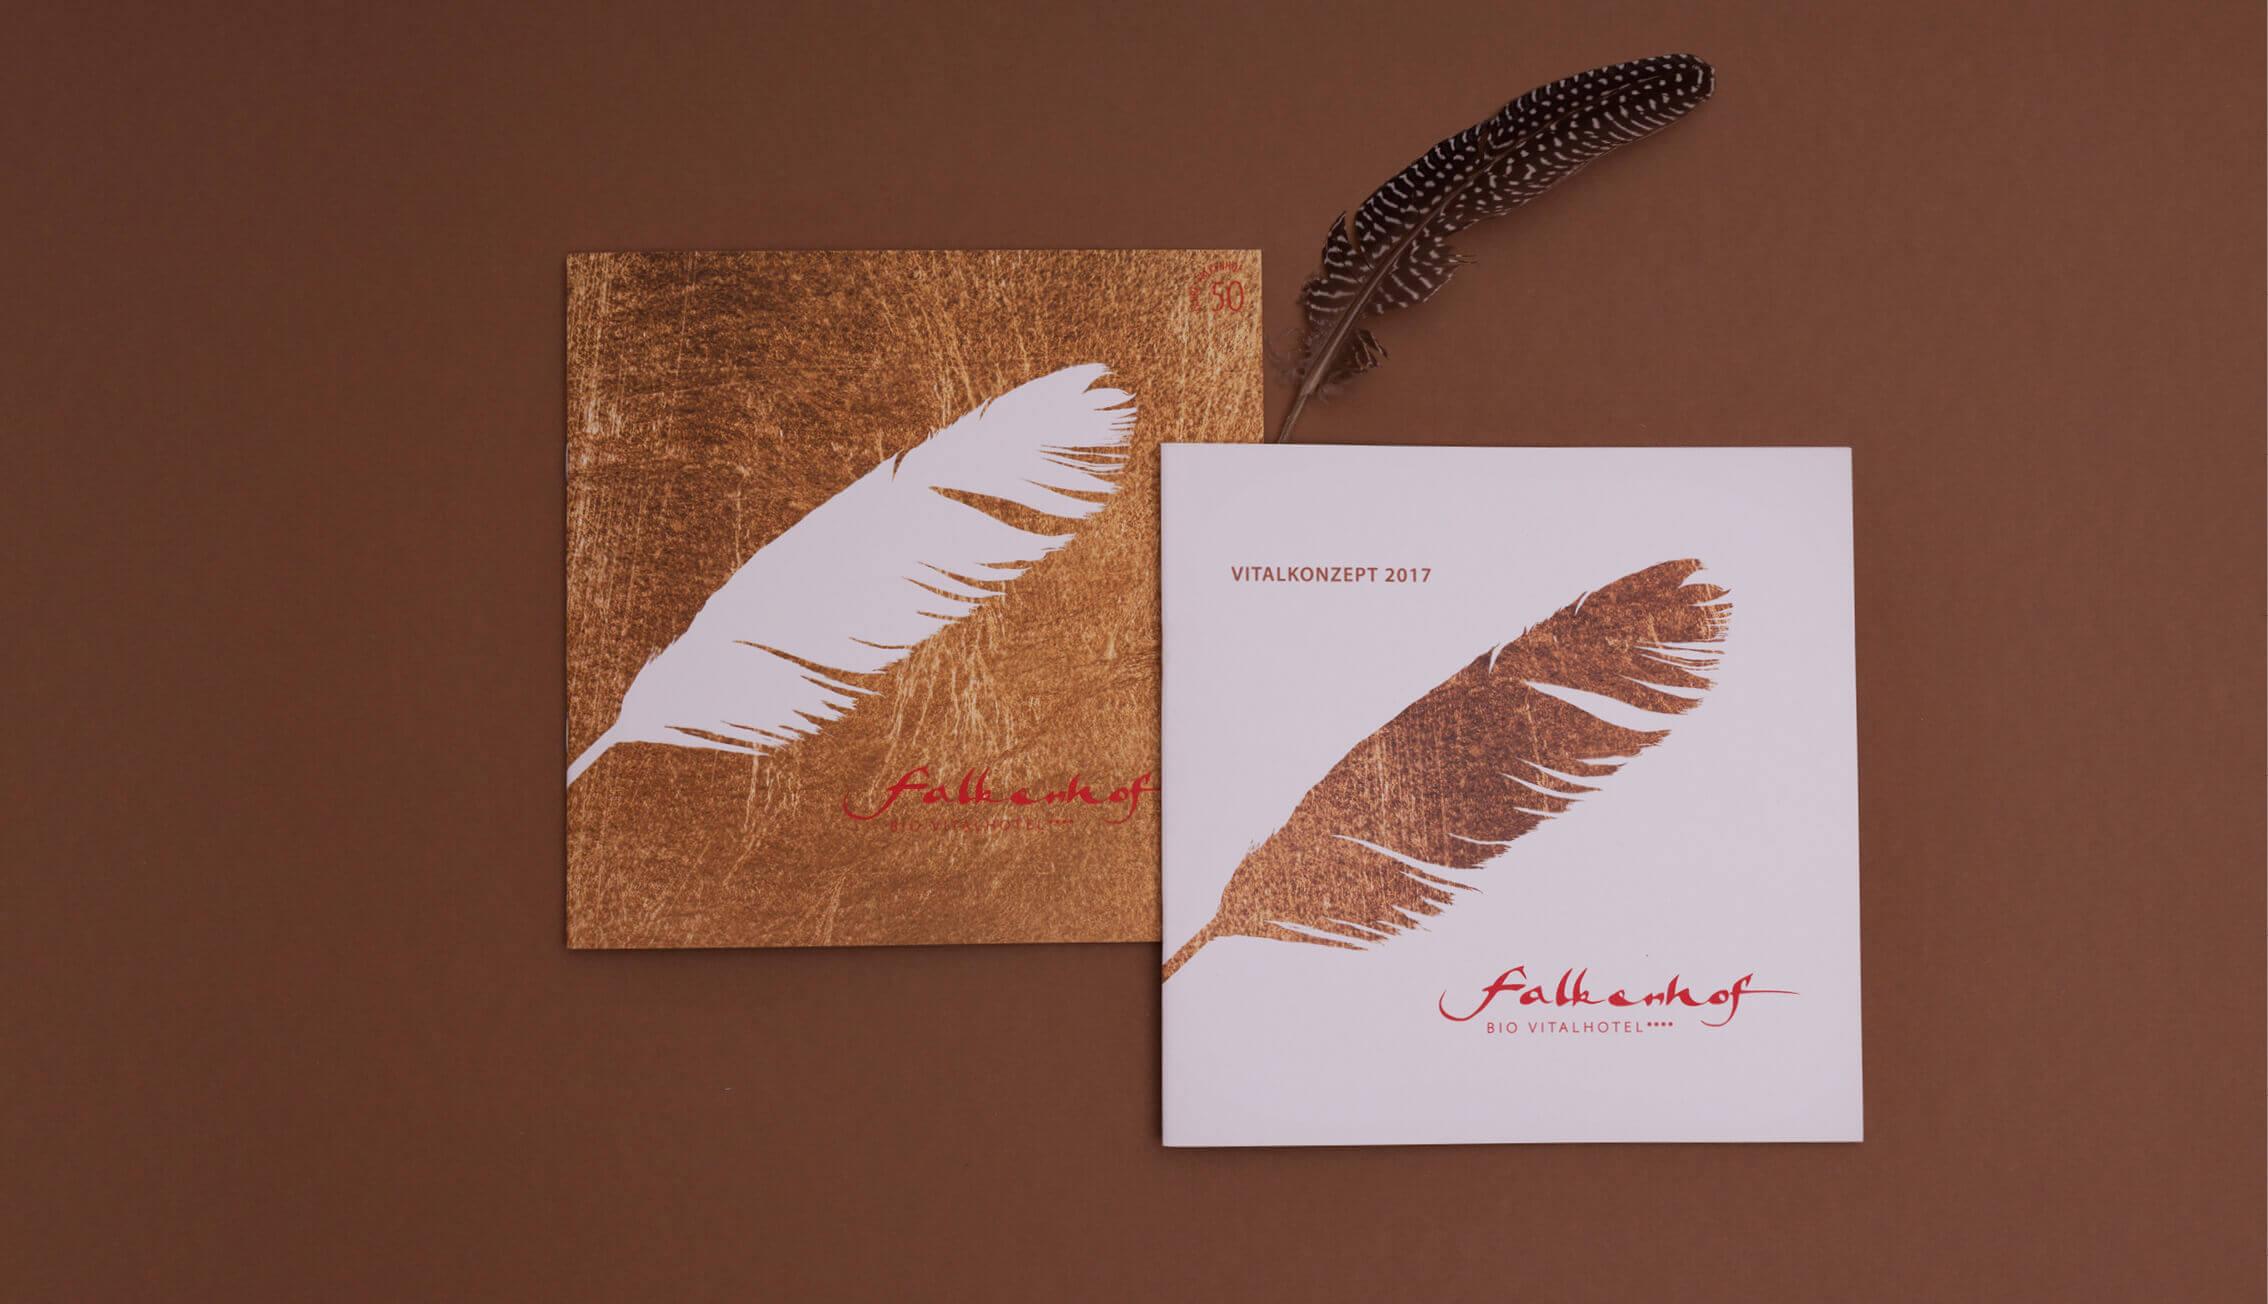 Falkenhof Bio Vitalhotel*** - Broschüren